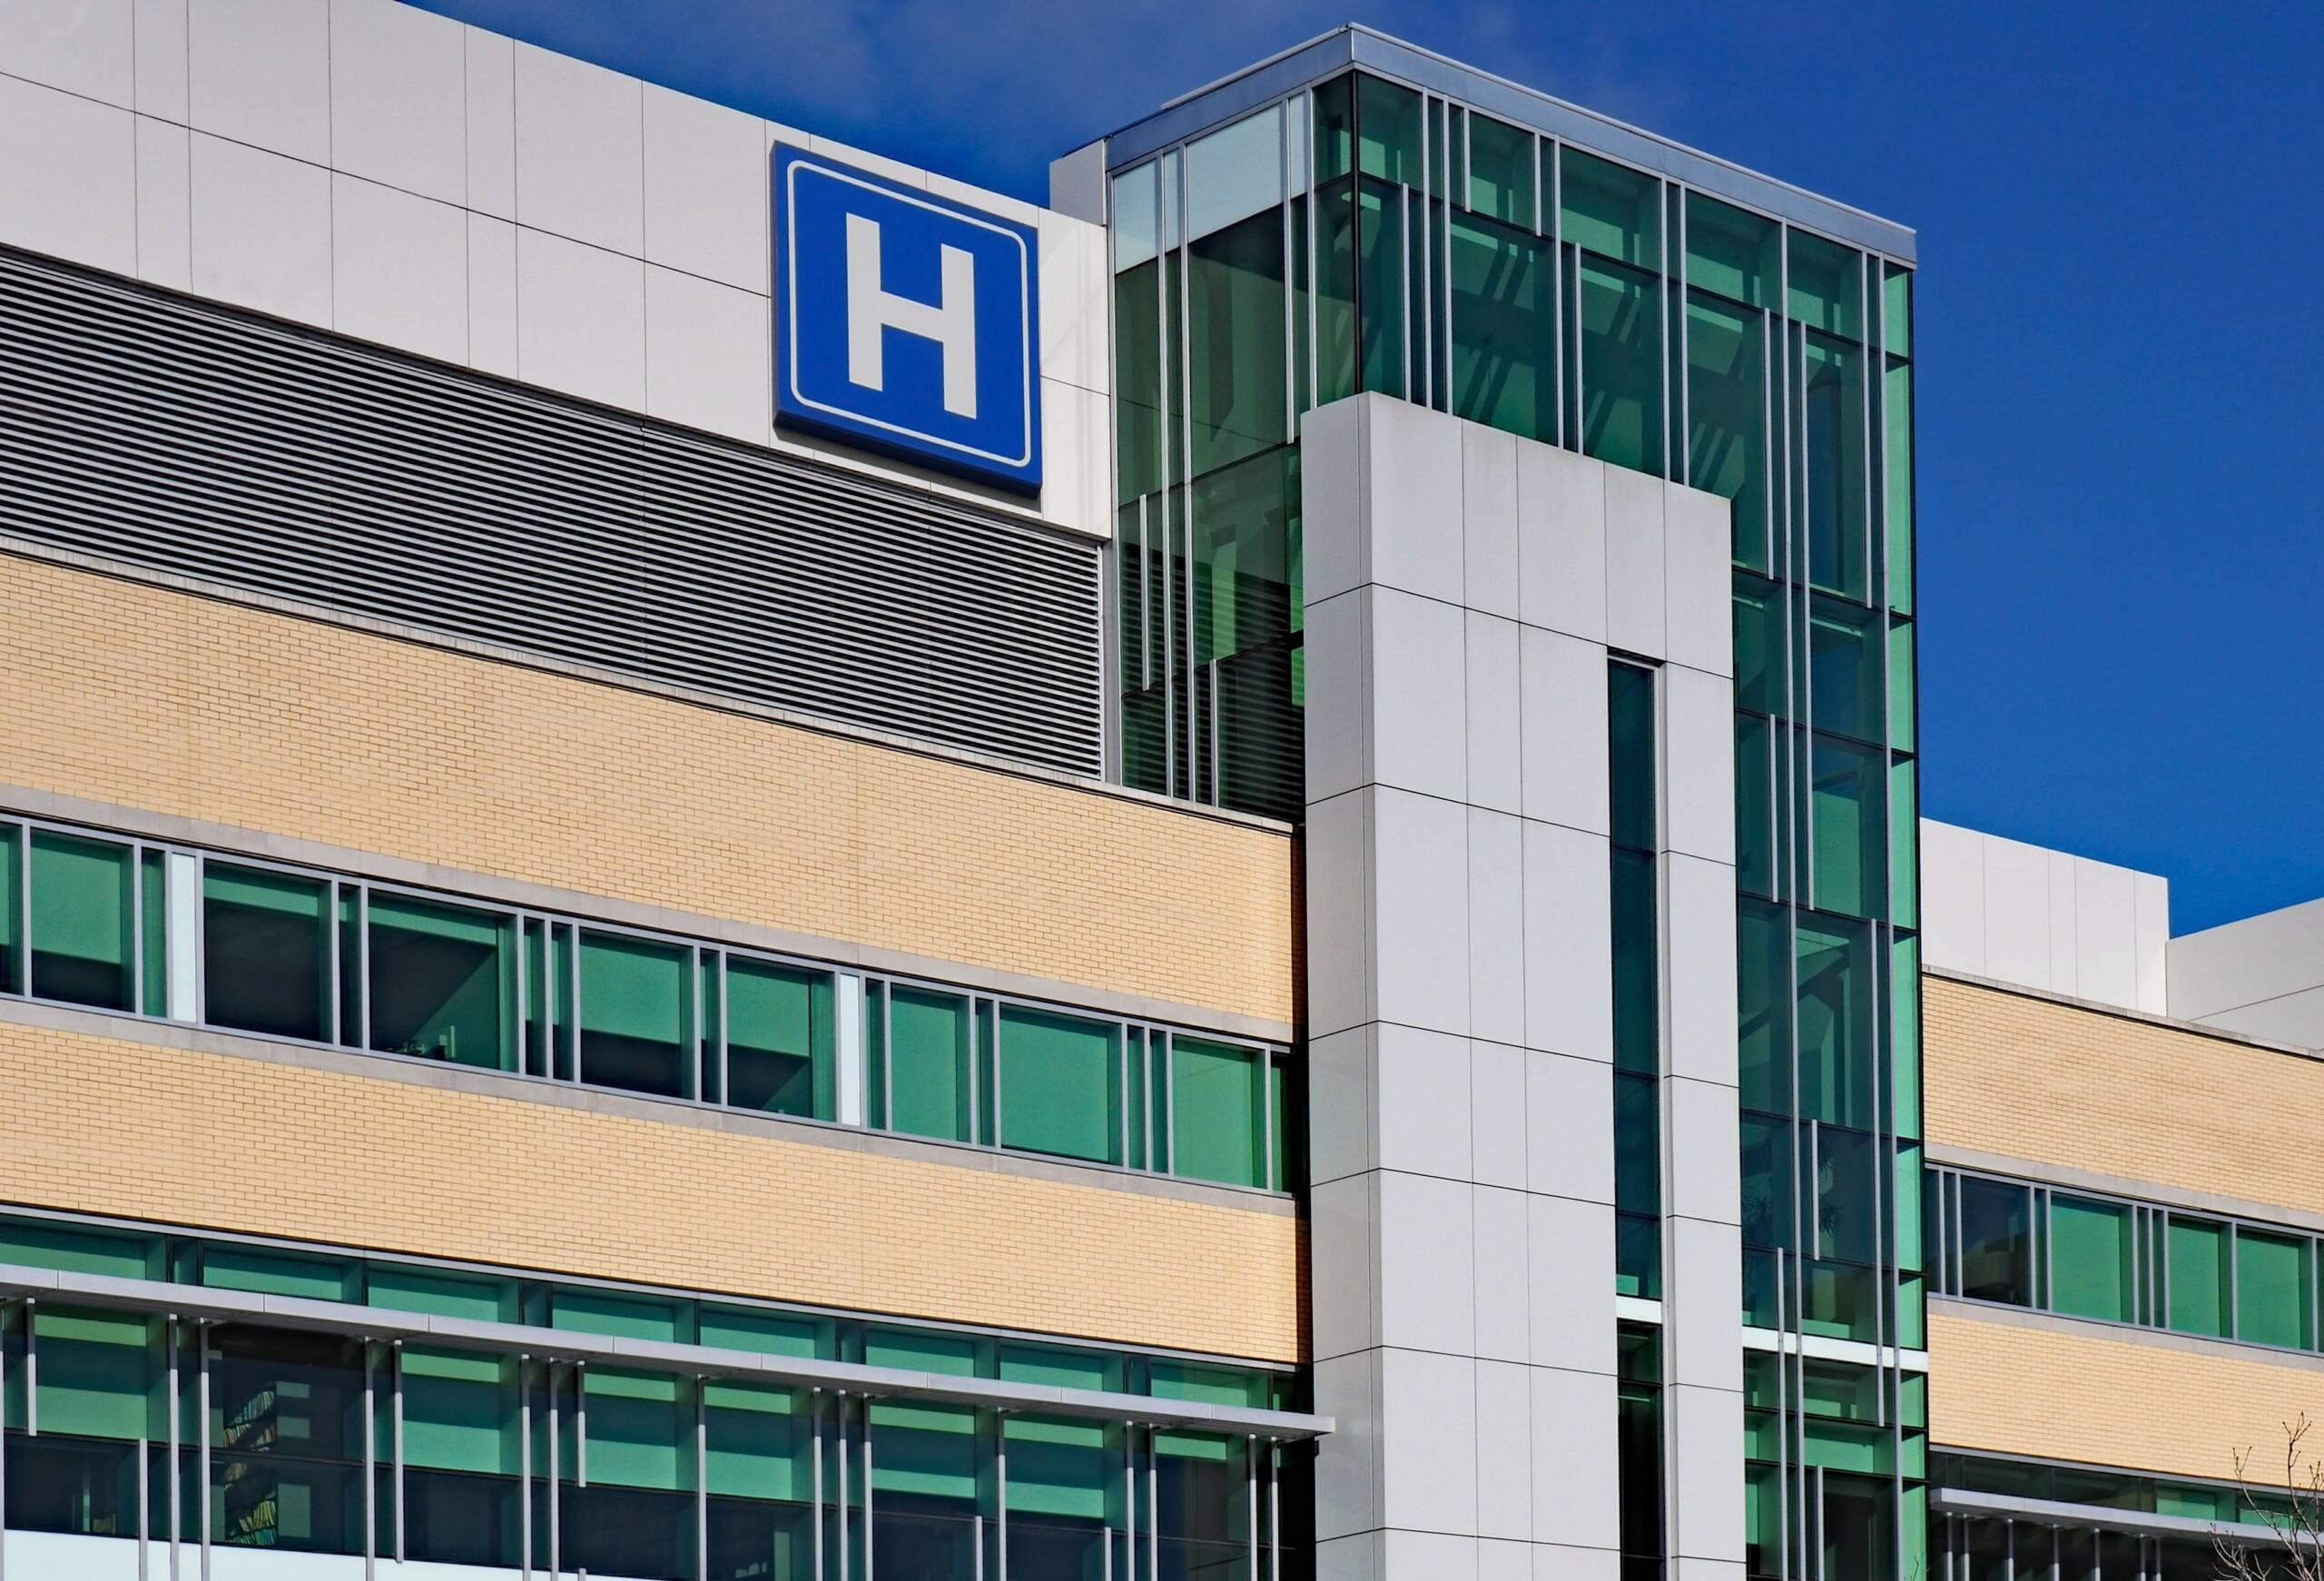 National Hospital Week 2020 – PSN Toolkit